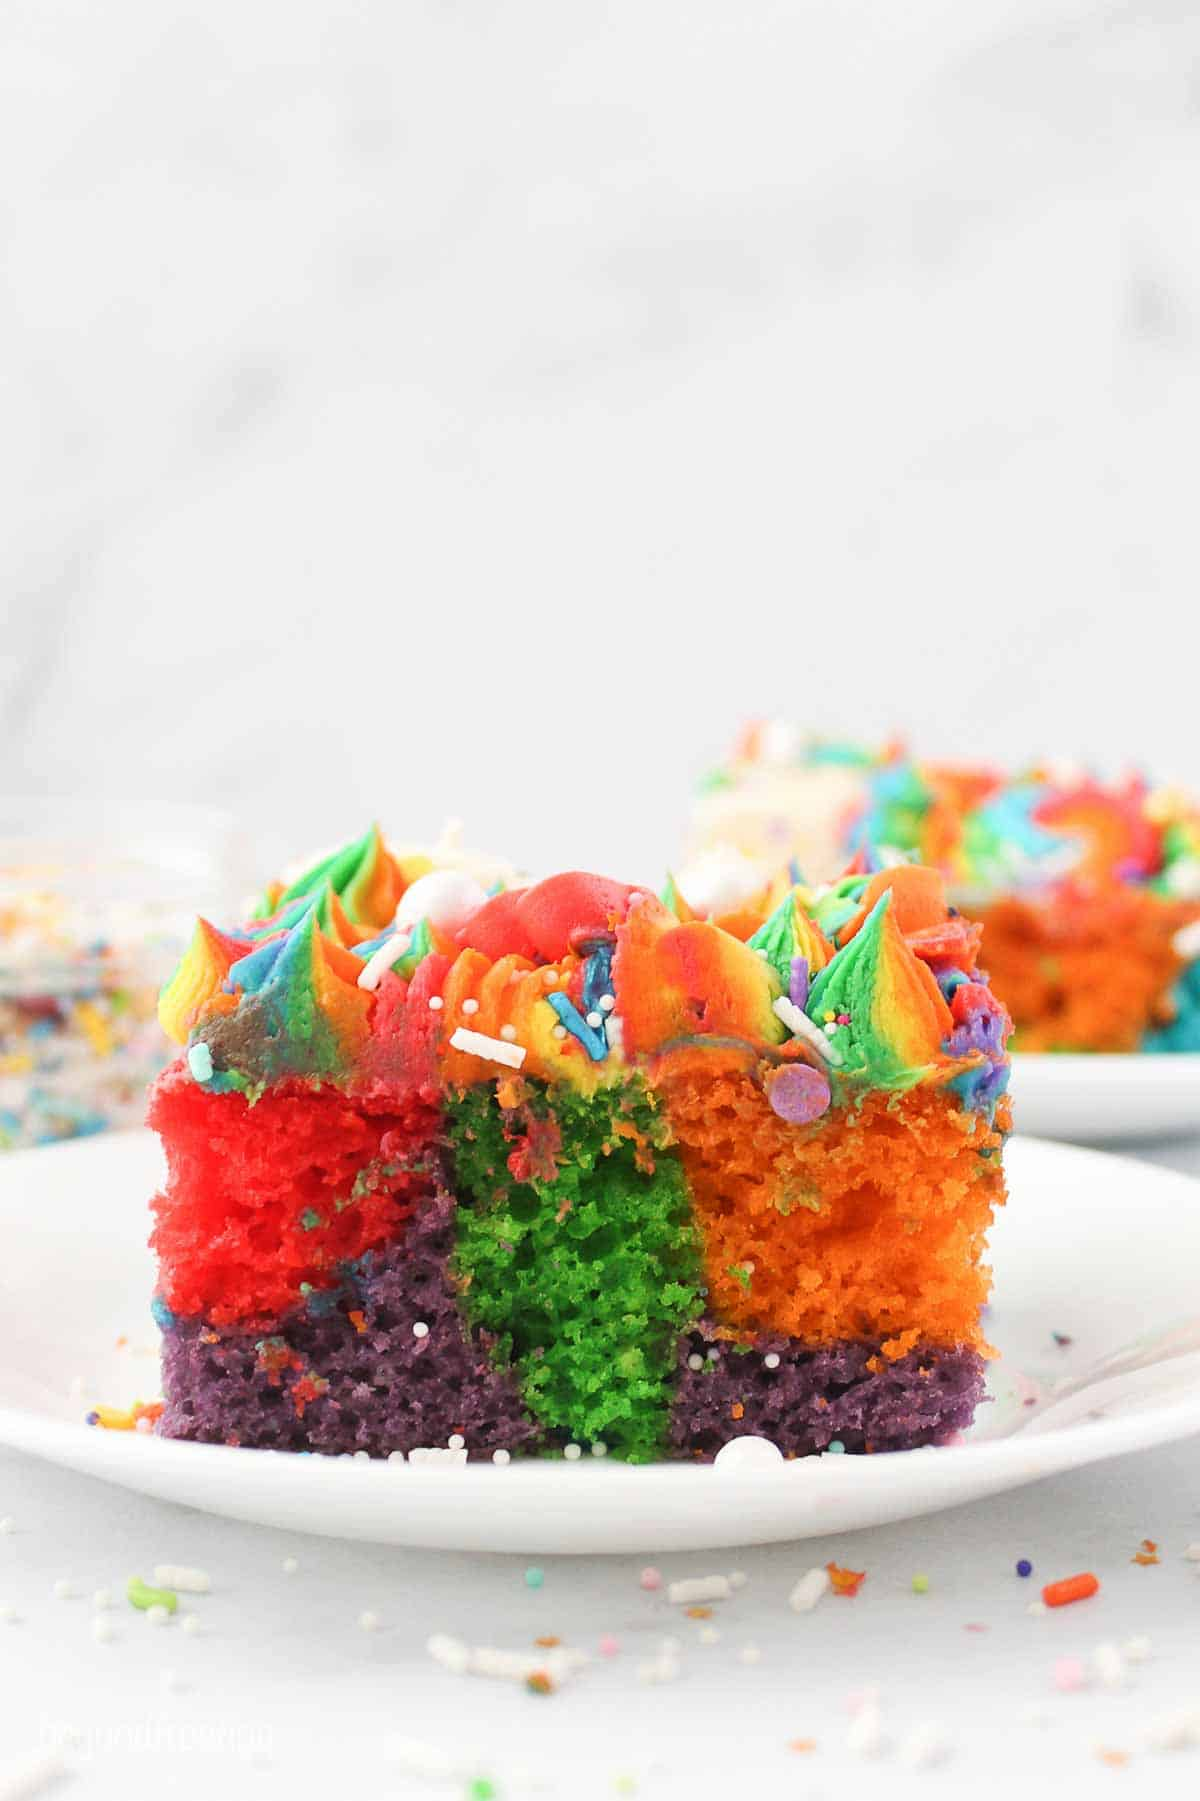 Side view of a slice of rainbowcake